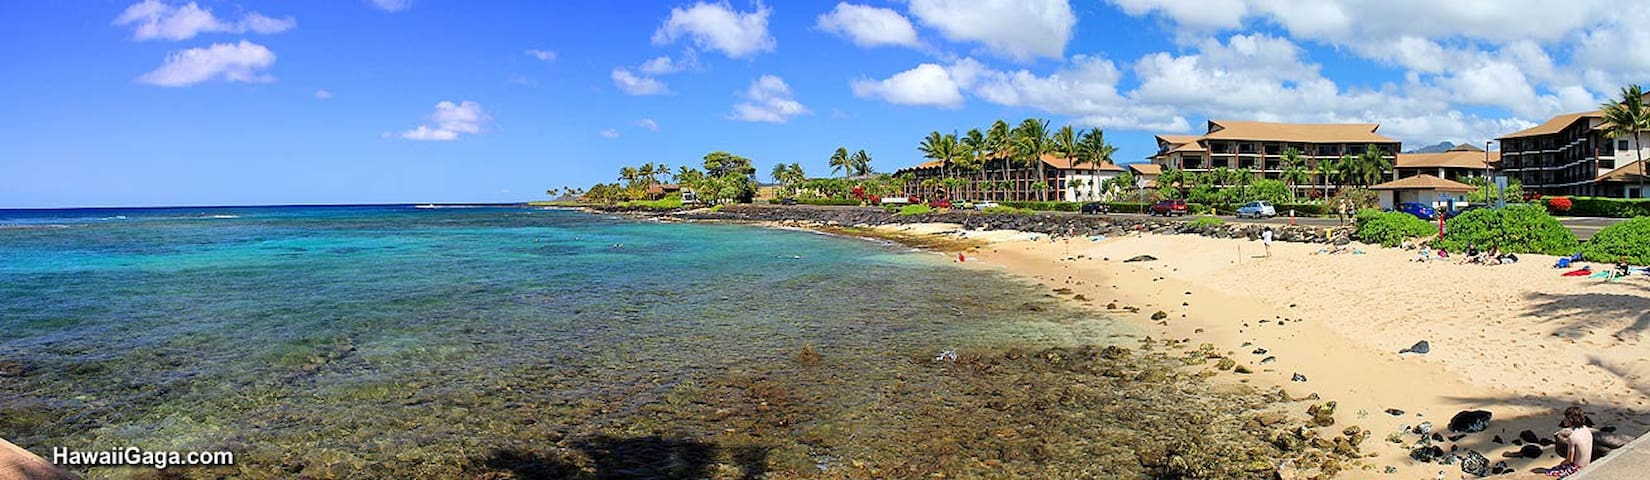 Lawai Beach Resort, 1 bdrm, Coral Bldg.